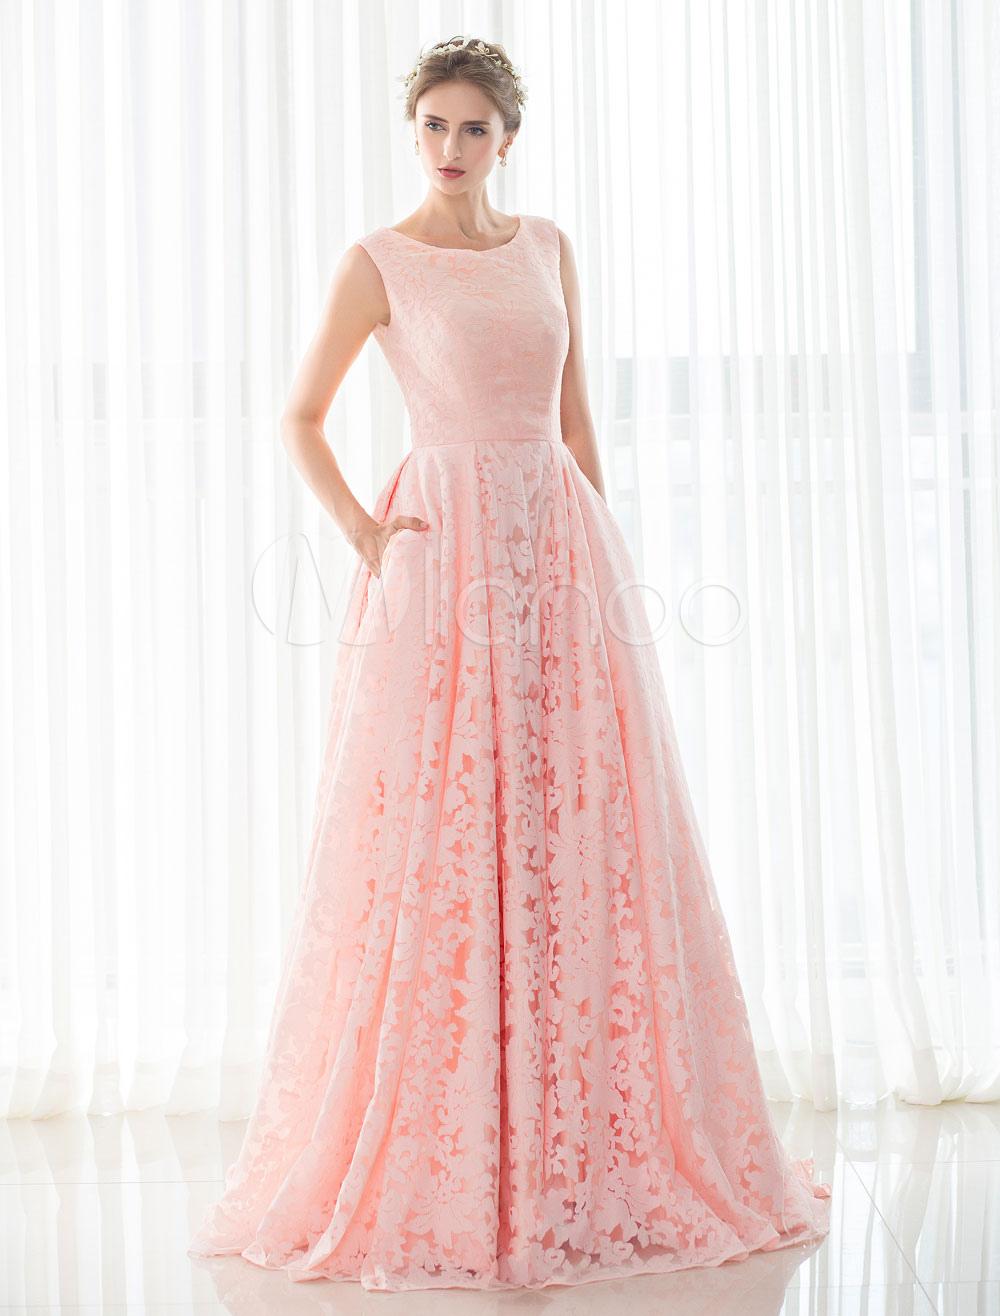 rosa hochzeitskleid lace a linie gericht zug rmellose. Black Bedroom Furniture Sets. Home Design Ideas